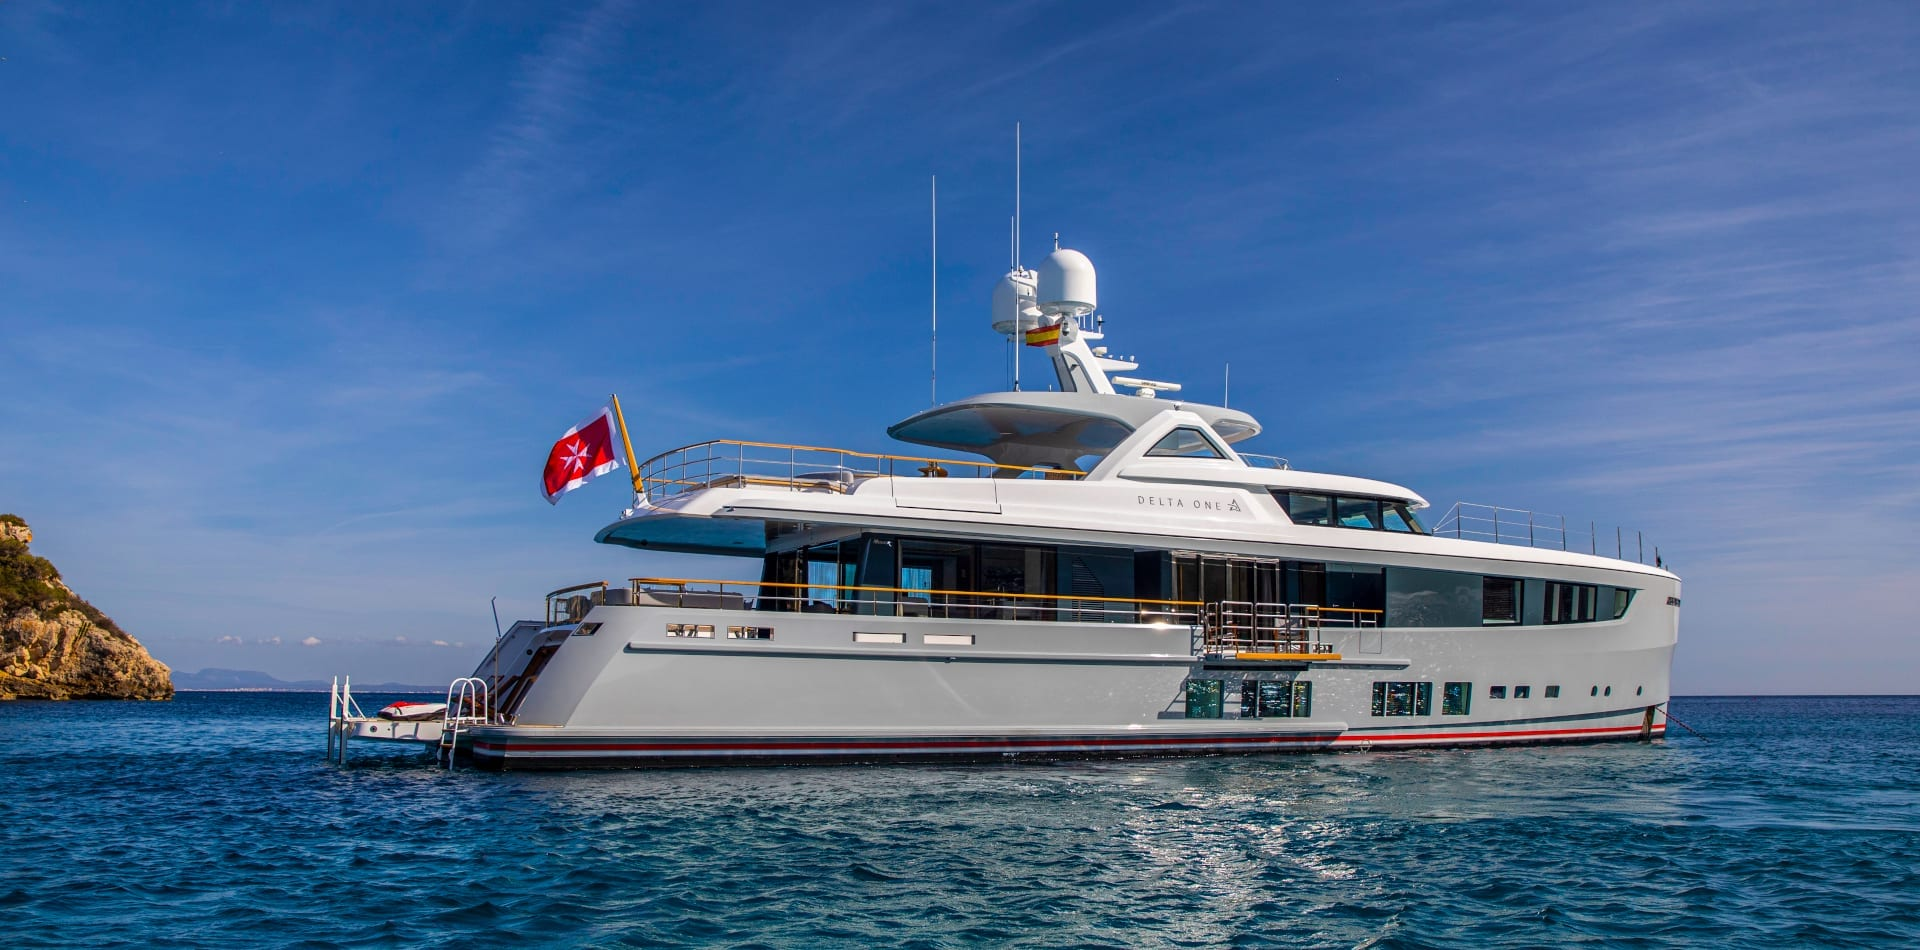 motor yacht delta one profile